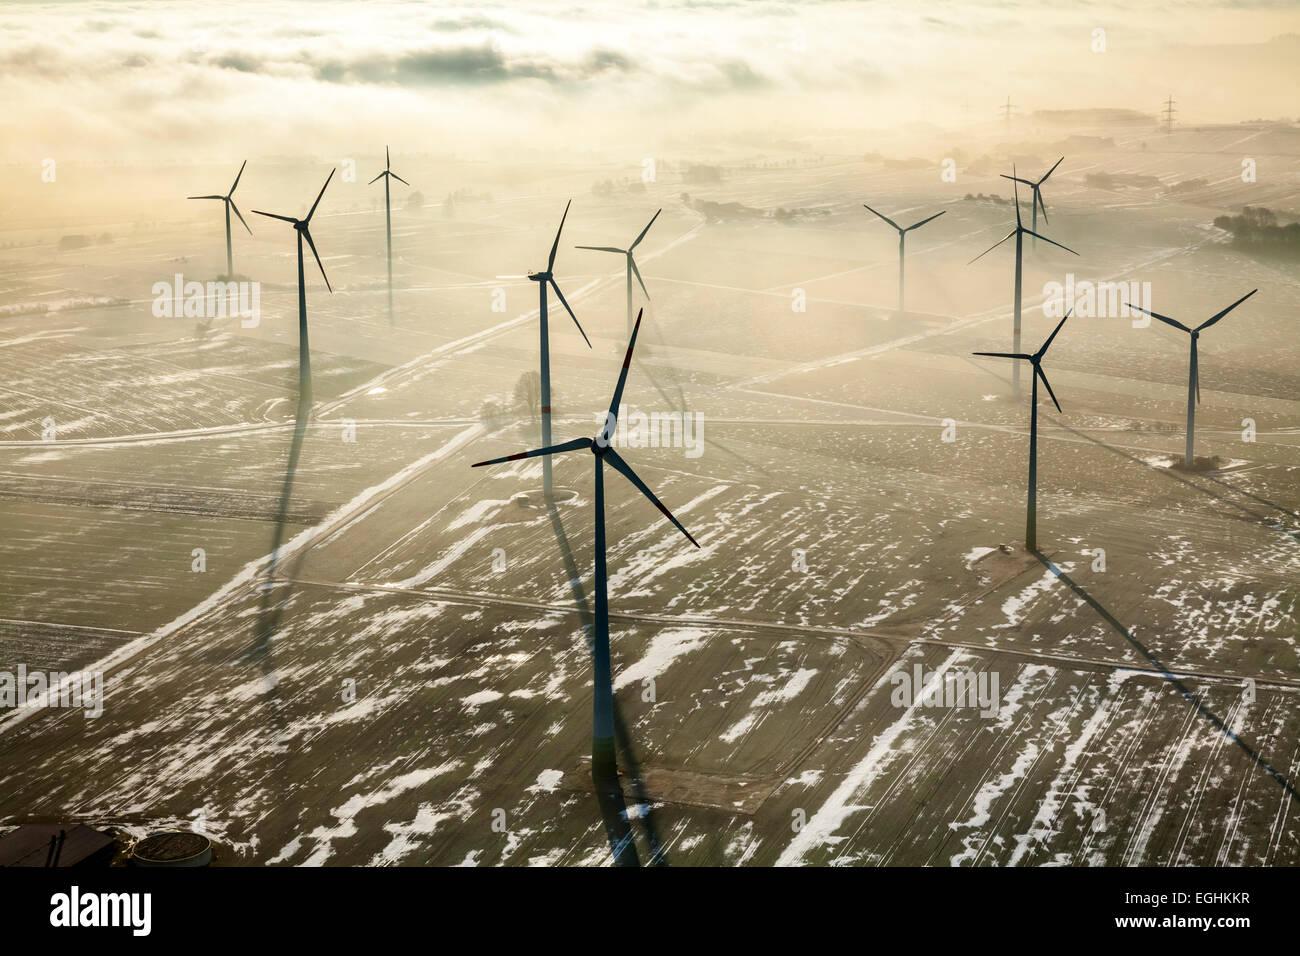 Wind farm in Madfeld, Brilon, Sauerland, North Rhine-Westphalia, Germany - Stock Image